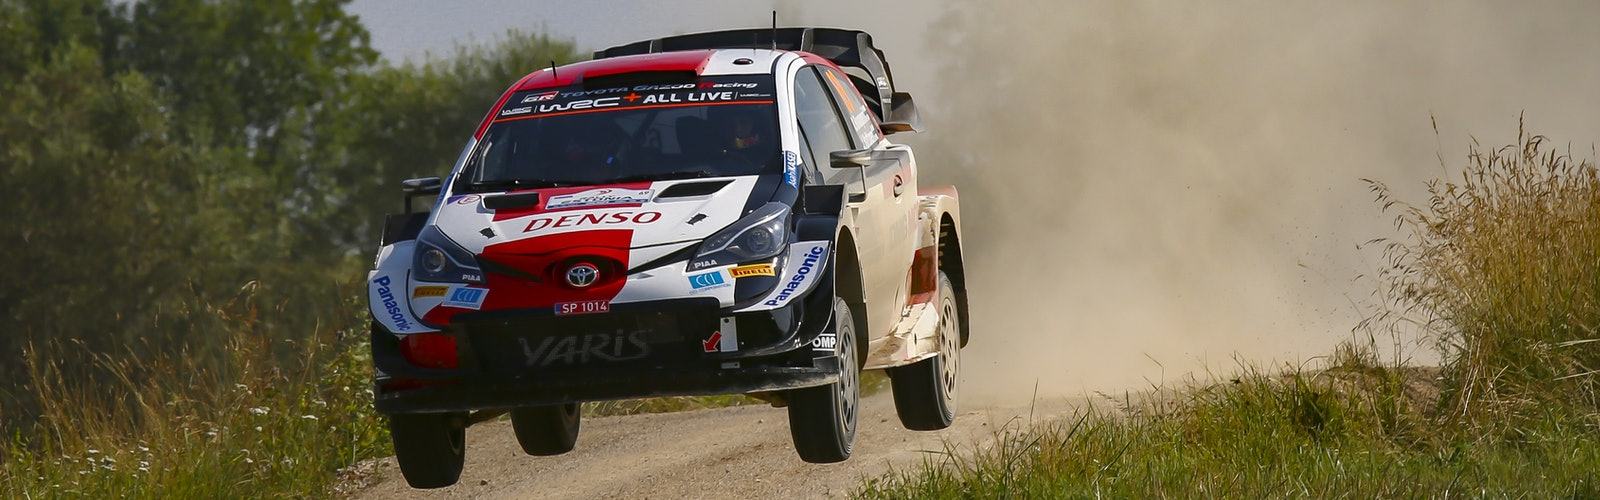 WRC_2021_Rd.7_101